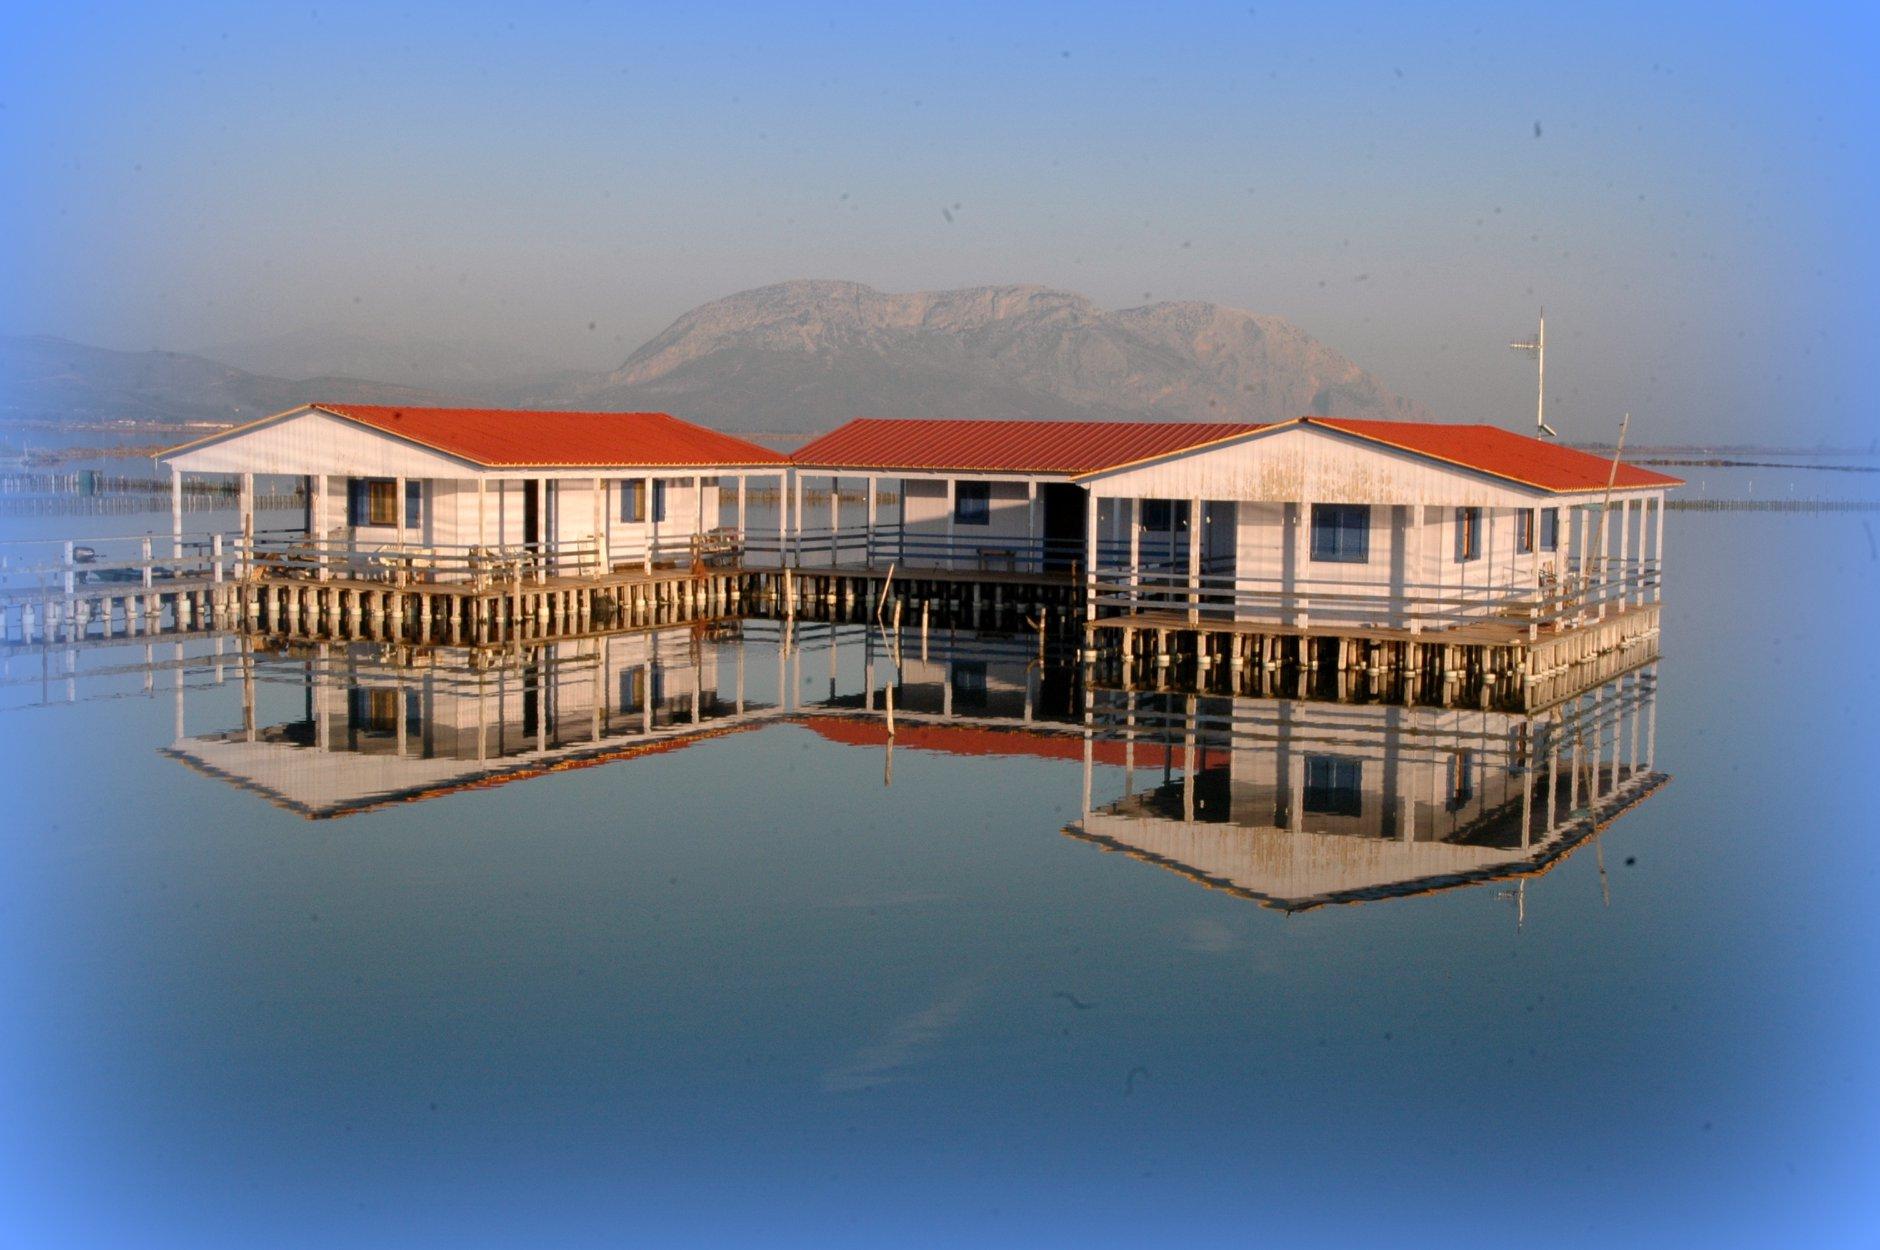 Yπέροχες λήψεις από τη λιμνοθάλασσα Μεσολογγίου